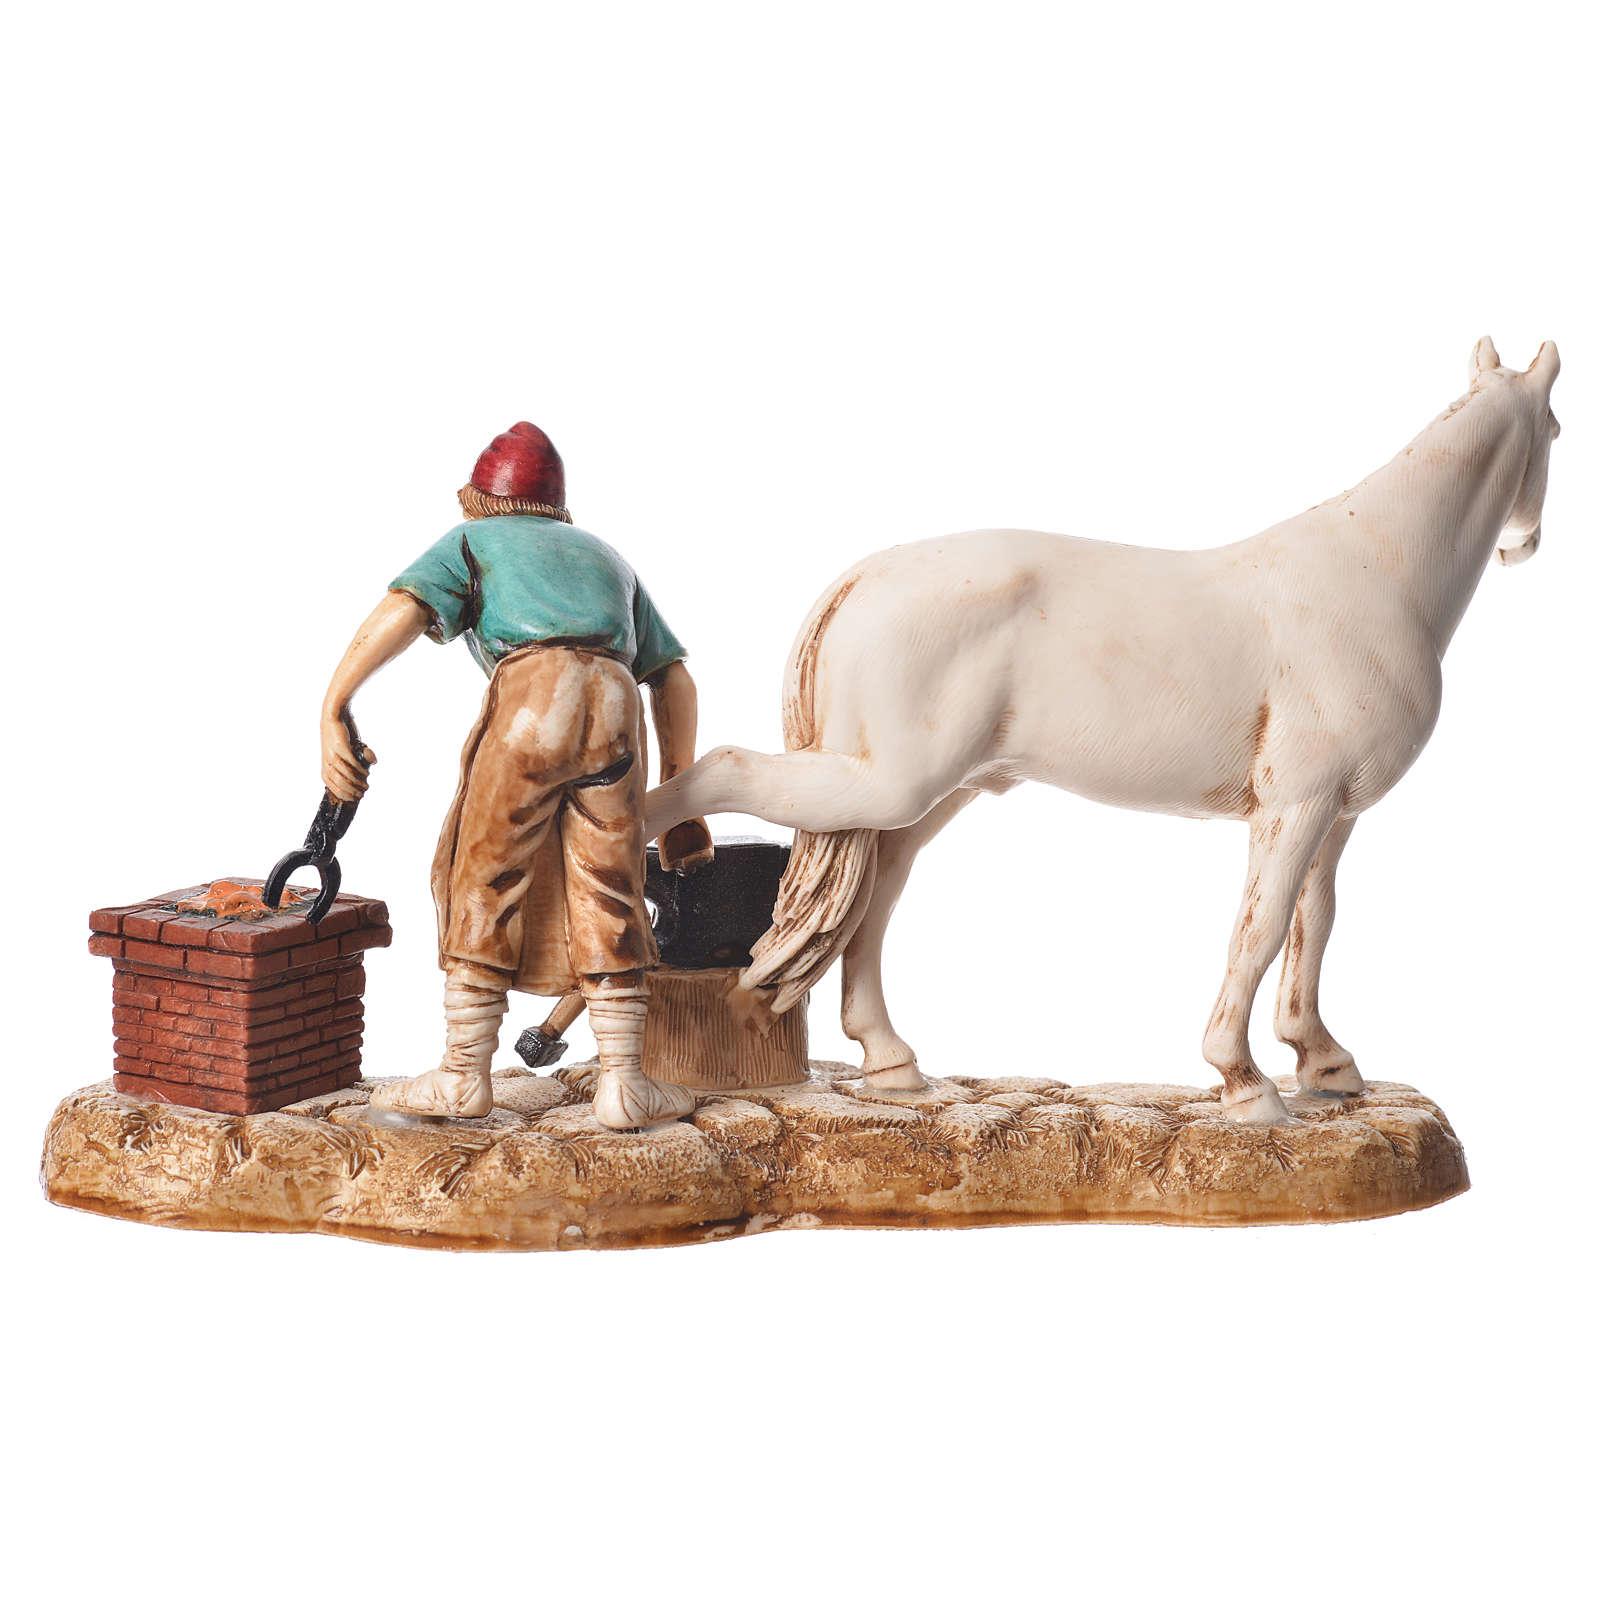 Shoer figurine 10cm, Moranduzzo 4